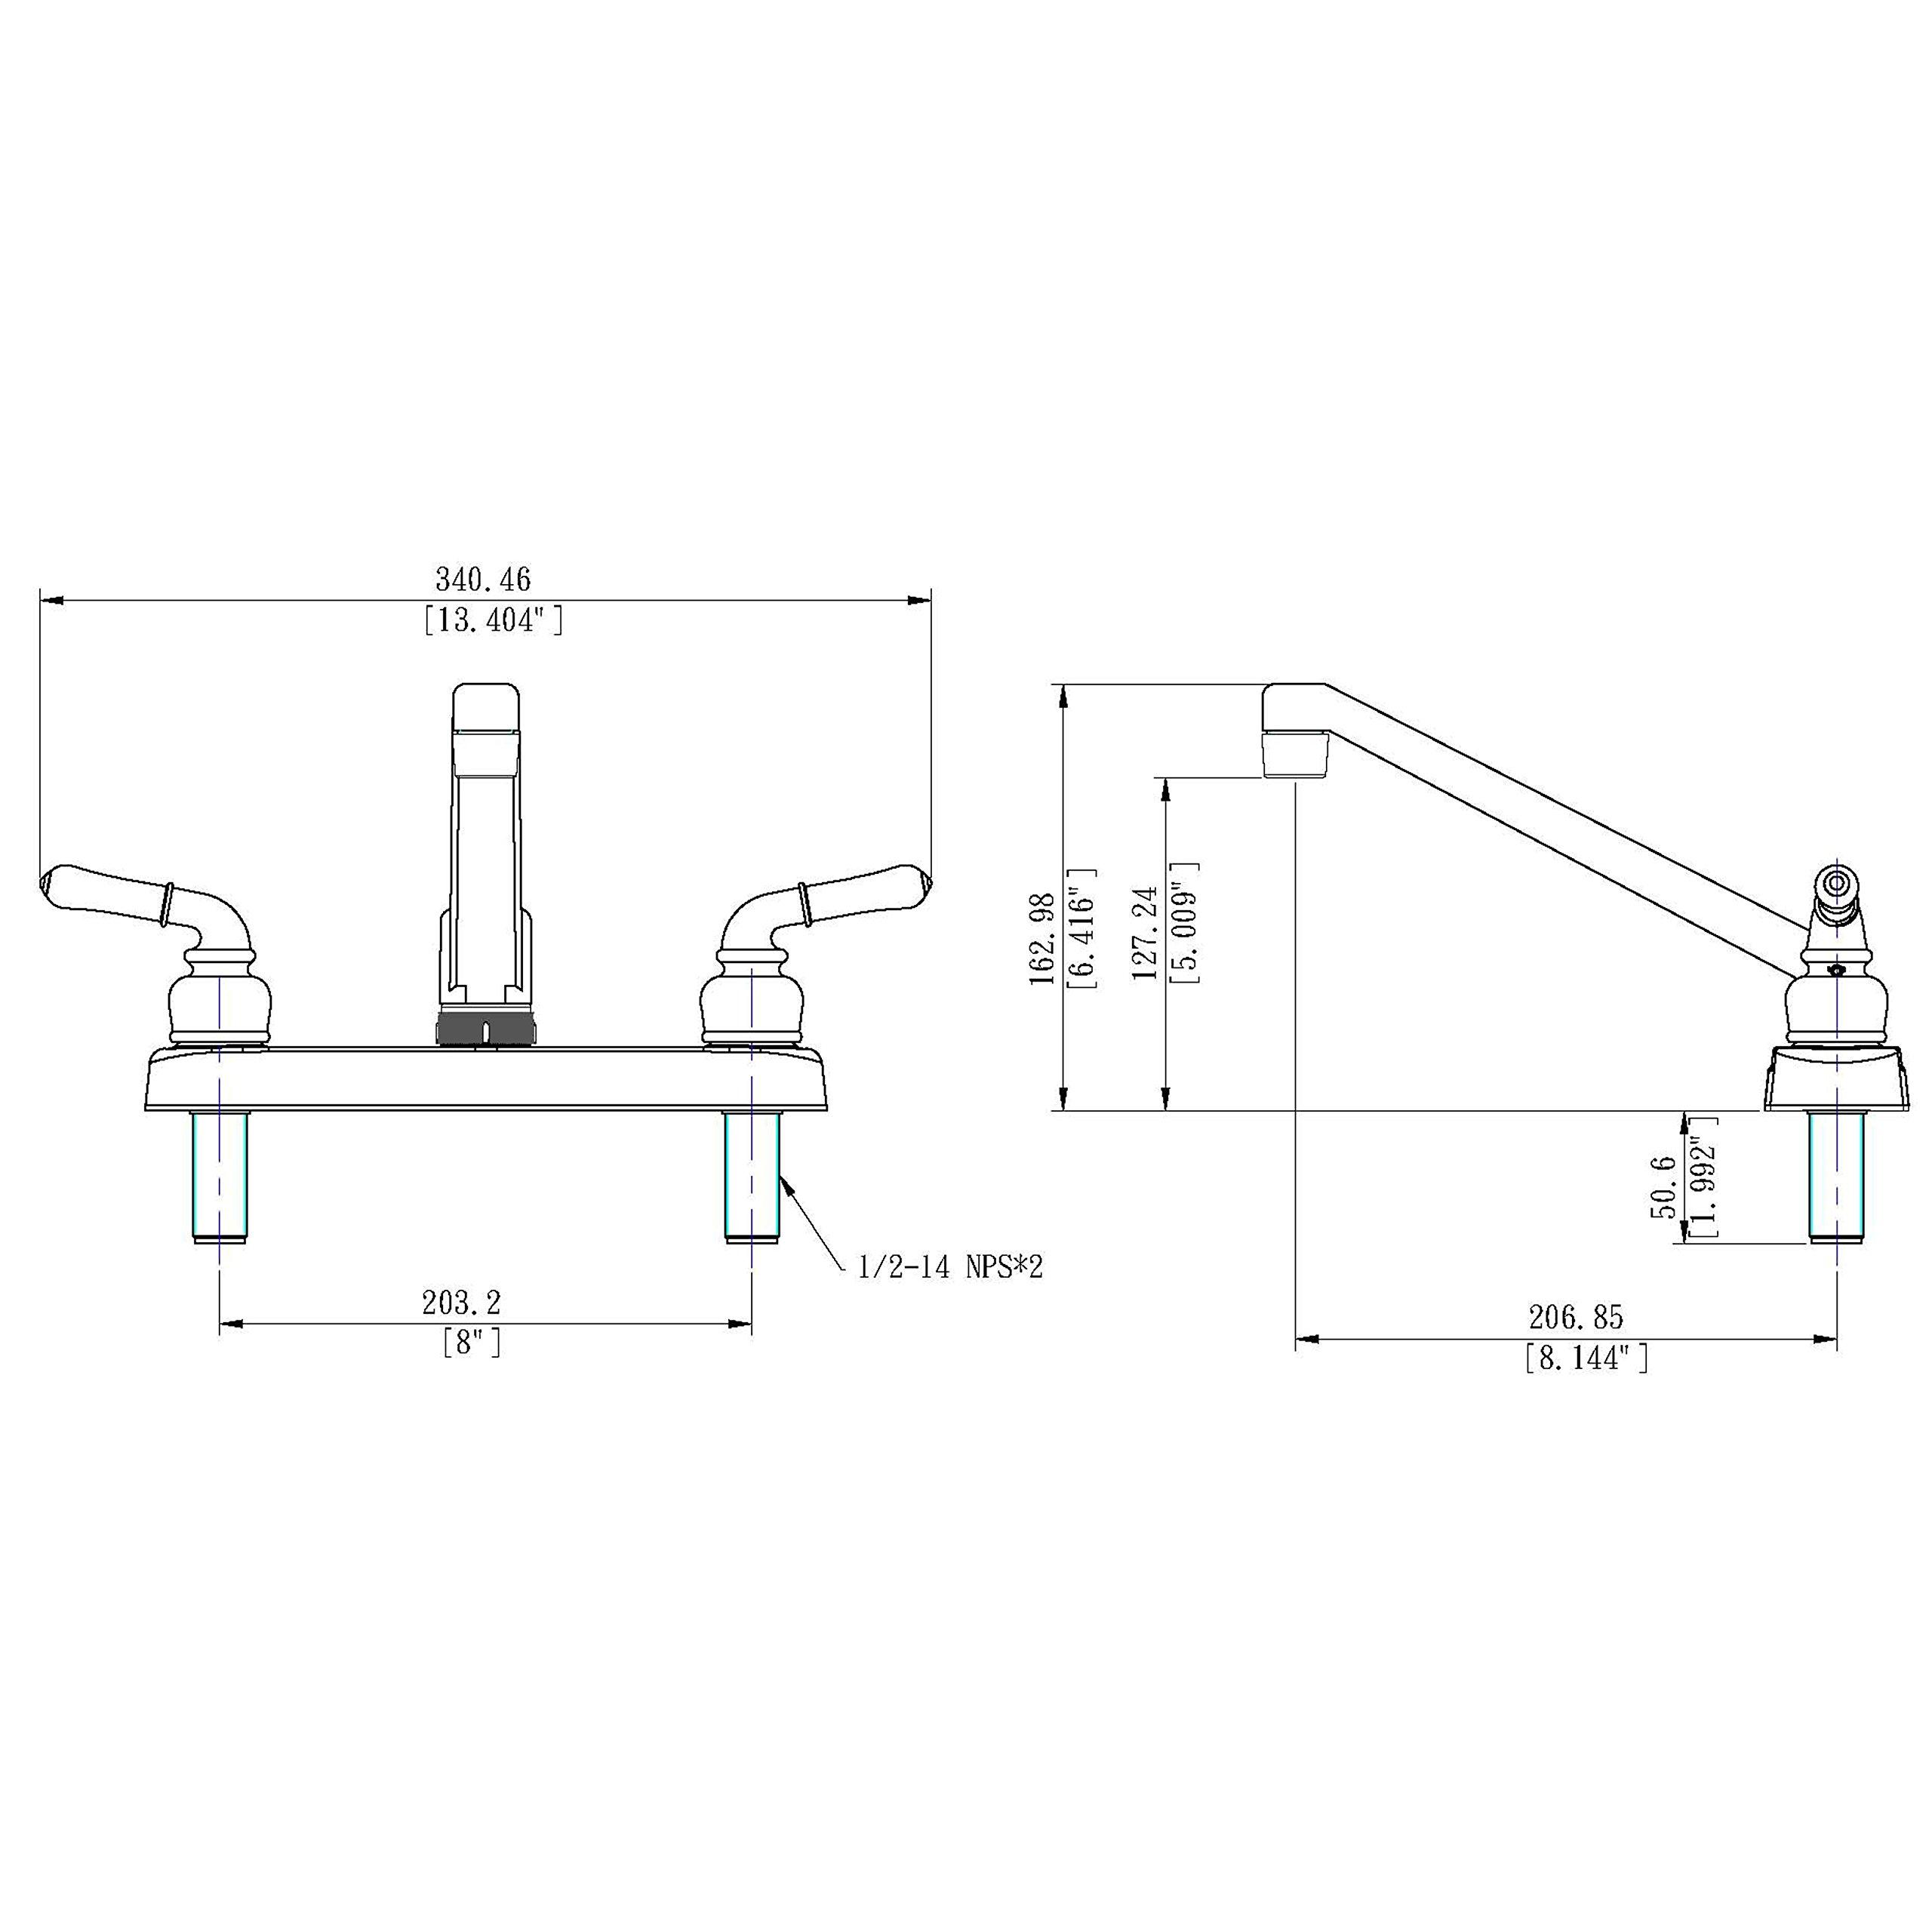 Builders Shoppe 1300CP RV Mobile Home Non-Metallic Swivel Kitchen Sink Faucet Chrome Finish